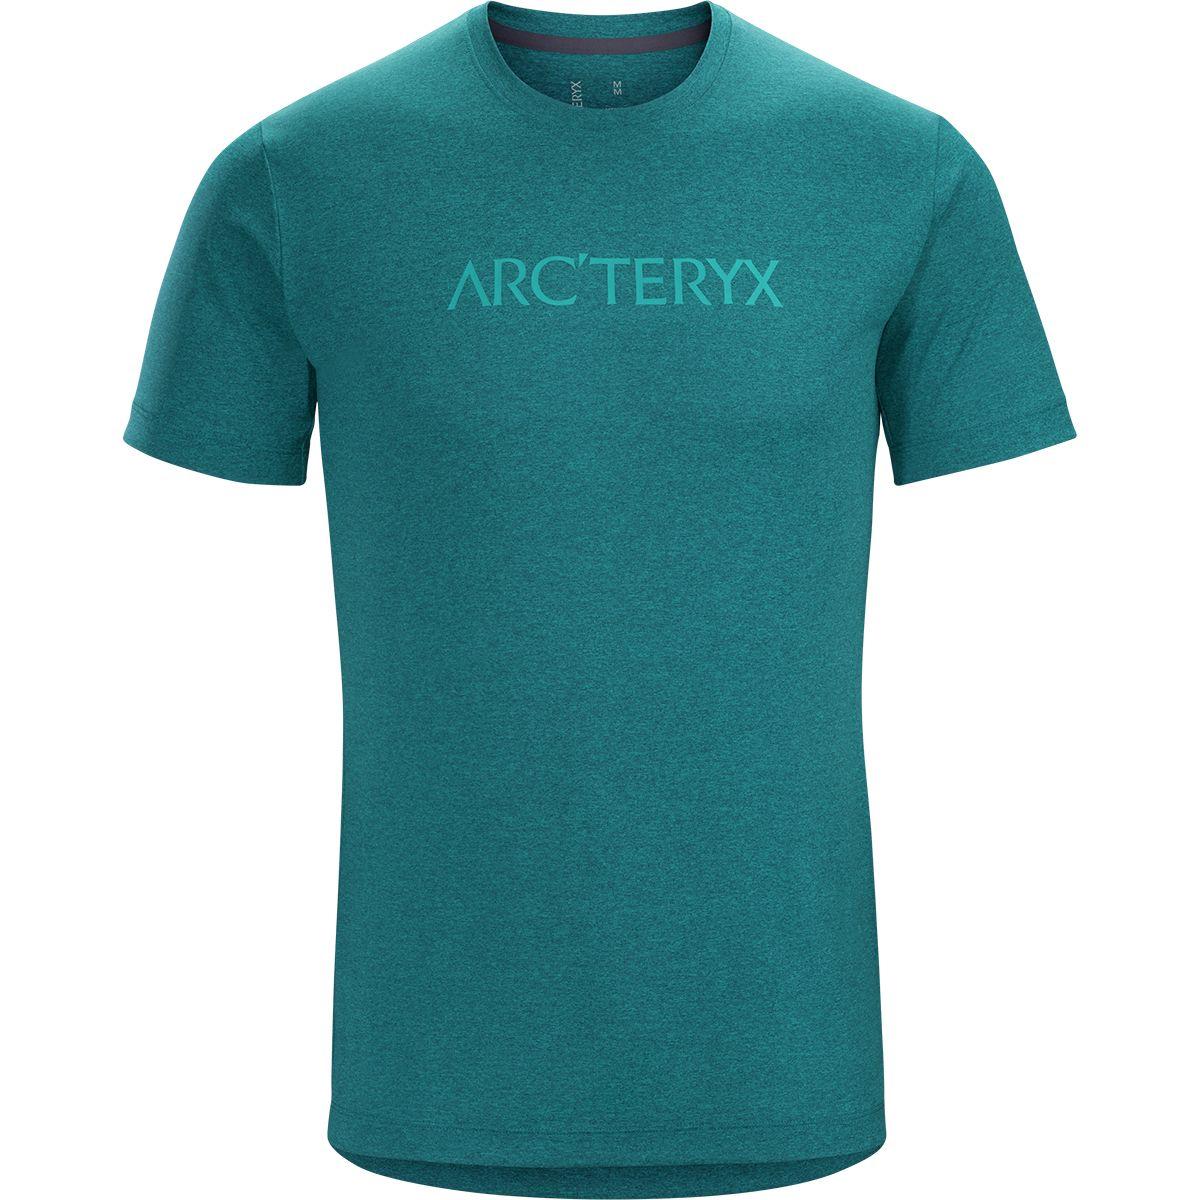 Arc'teryx Centre T-Shirt